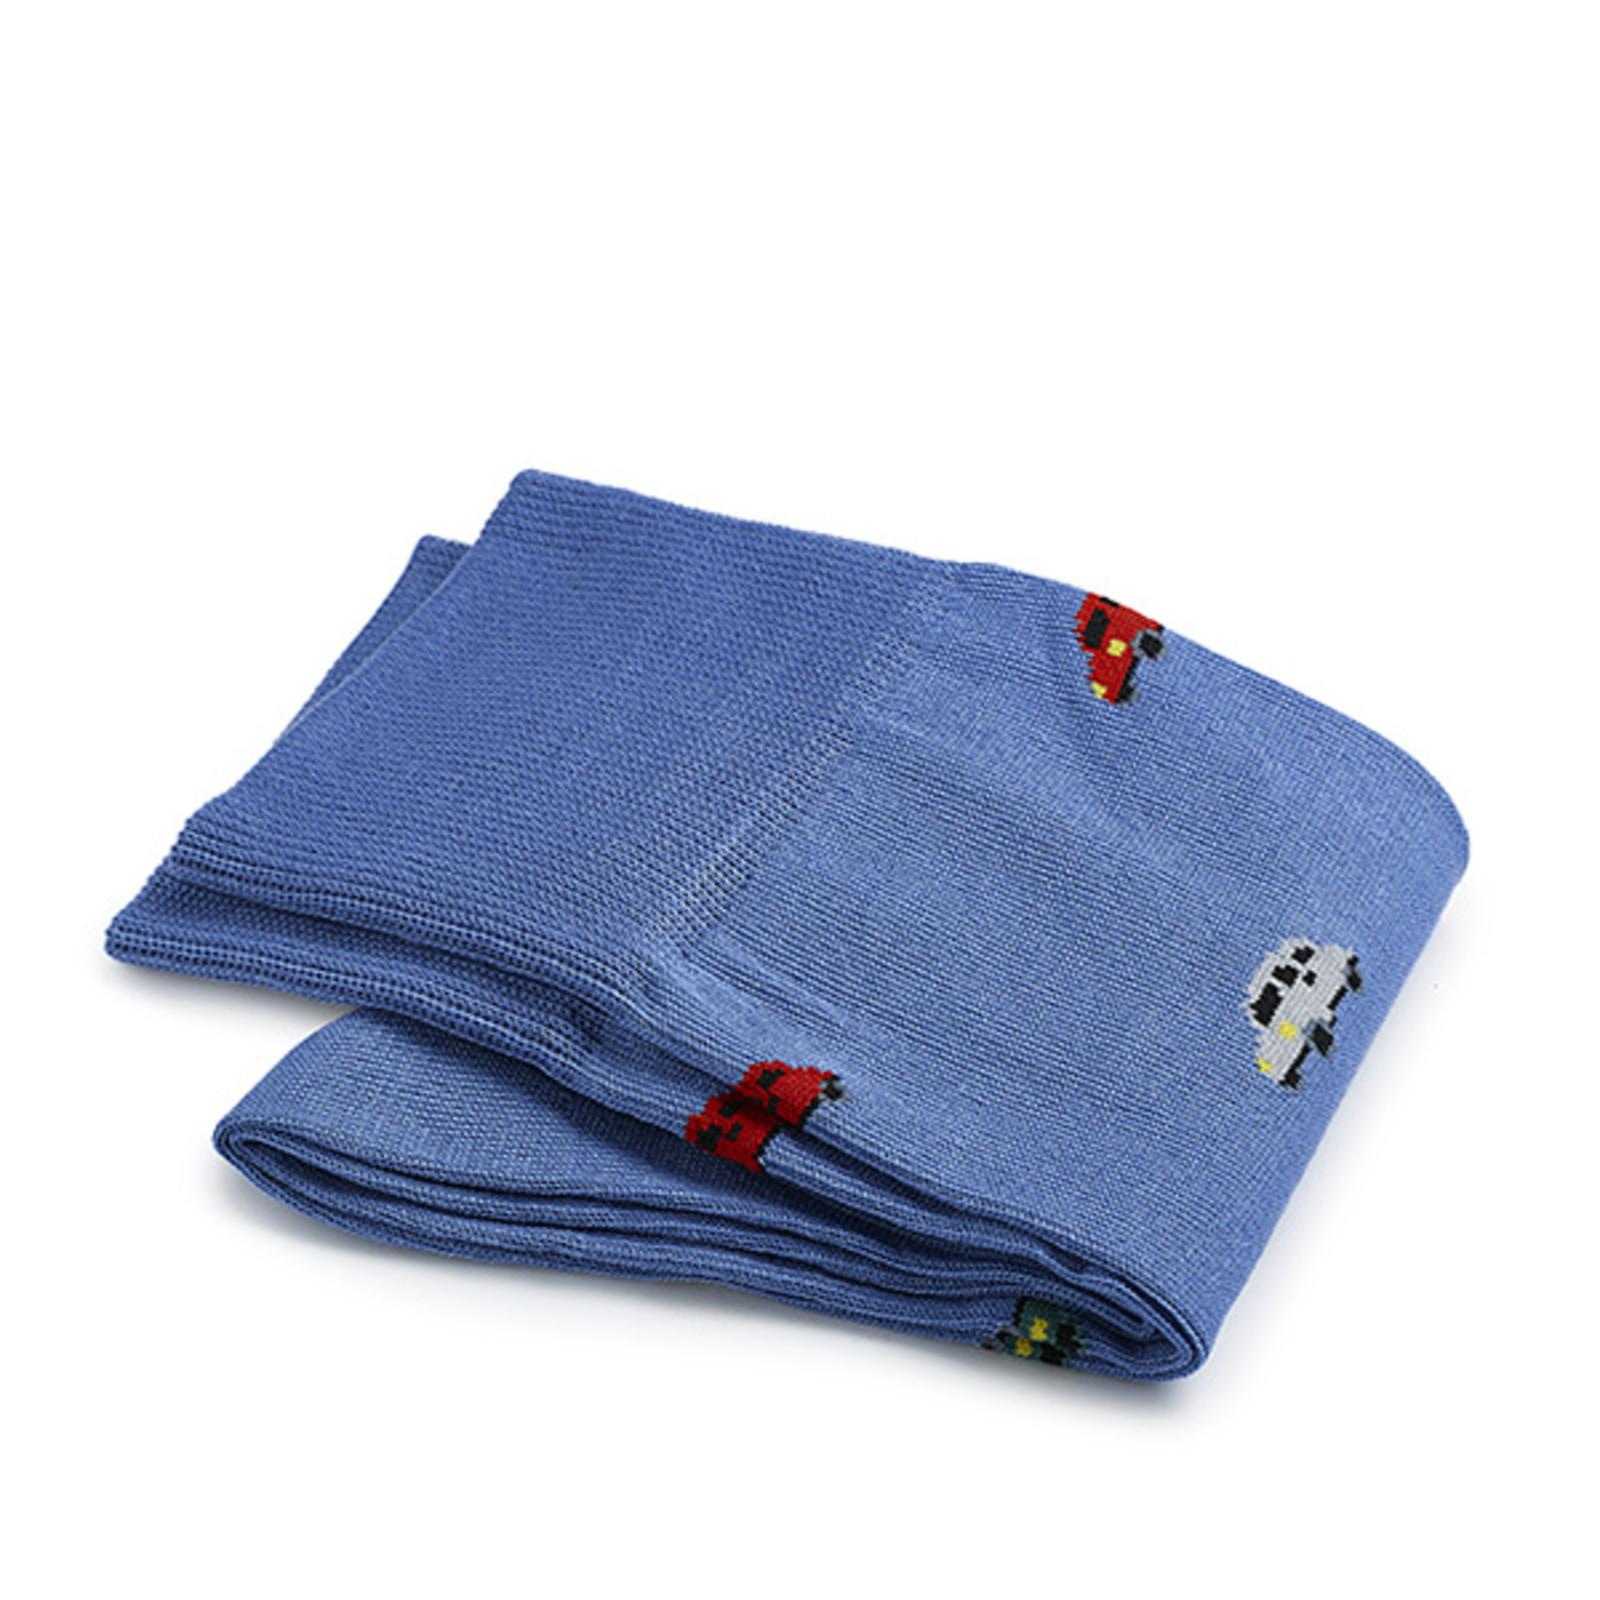 Carlo Lanza Hellblaue italienische Auto Socken Baumwolle